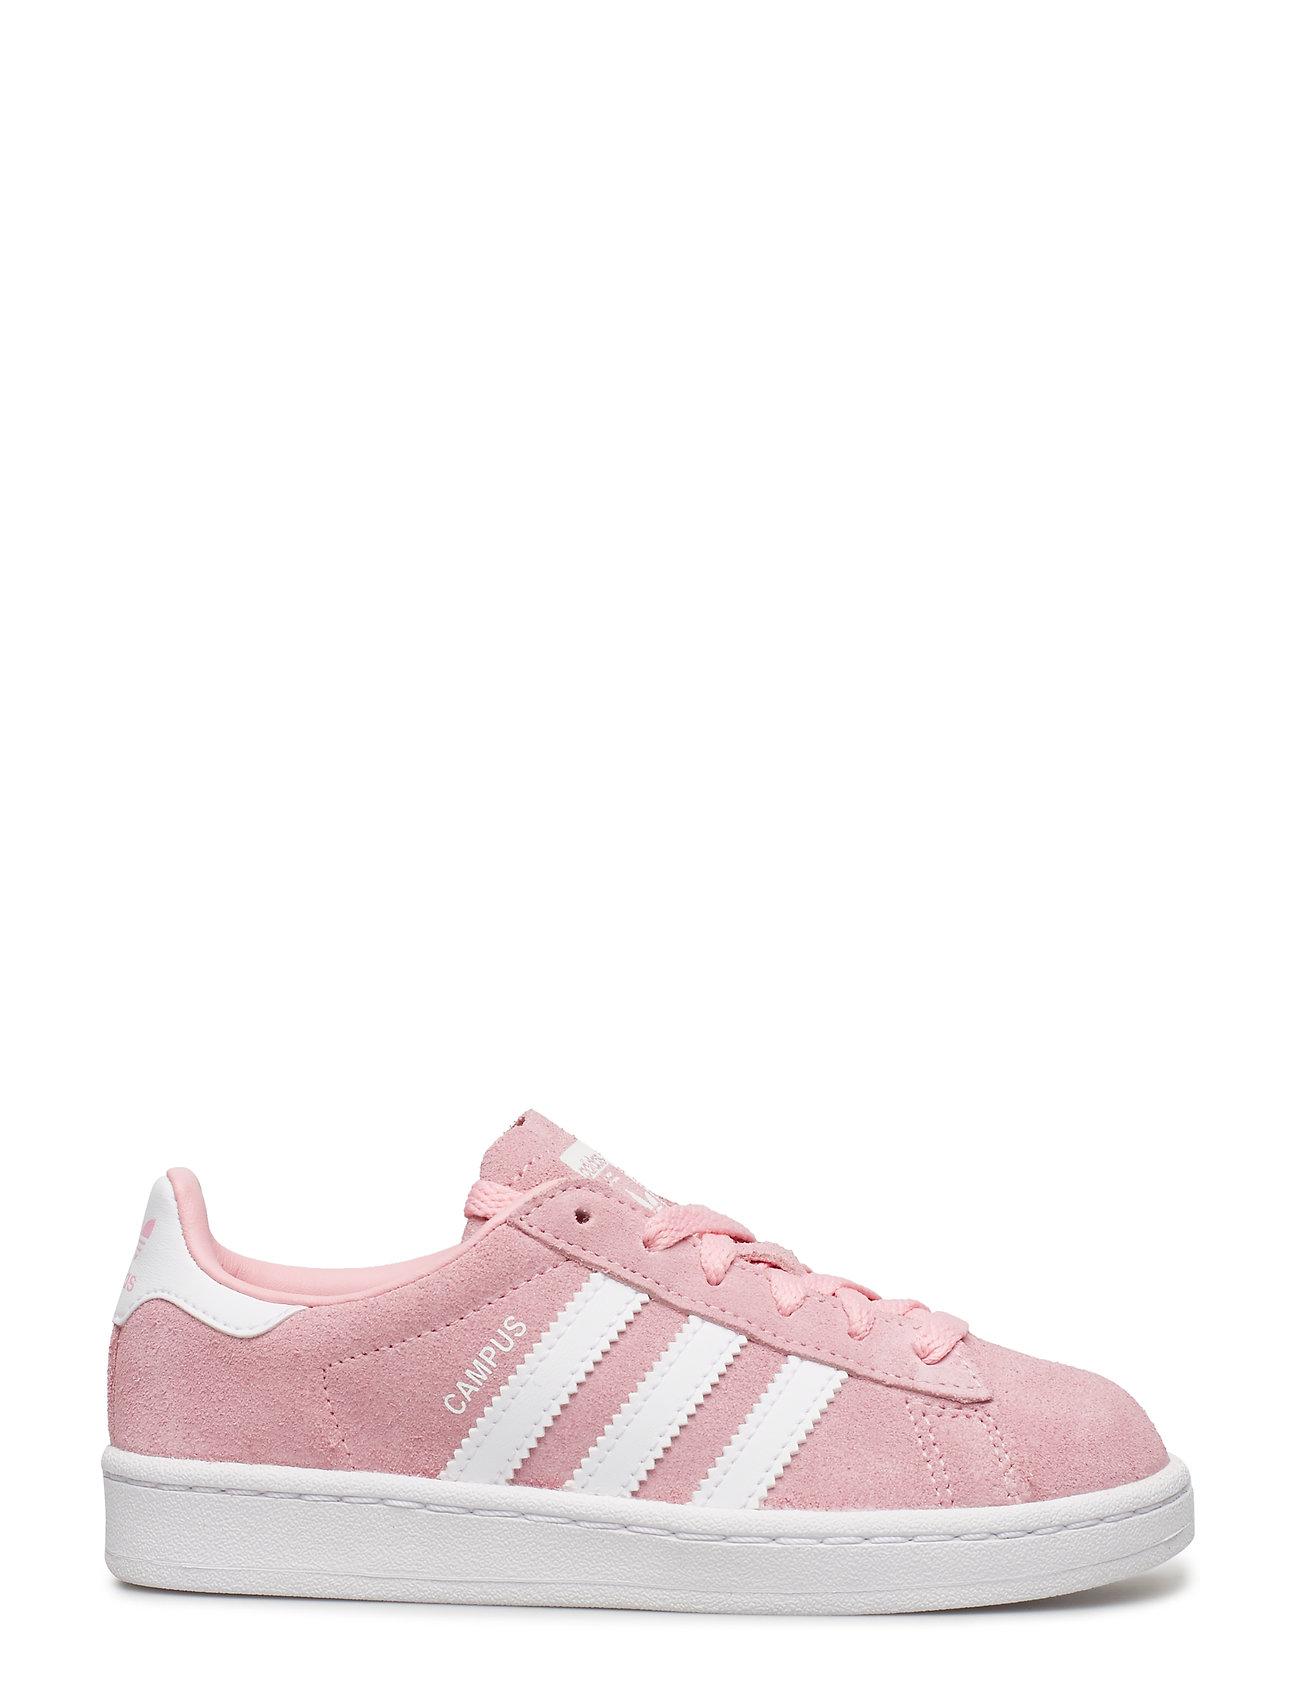 fa838350a22 LEGIVY/FTWWHT/FTWWHT Adidas Campus C sneakers for børn - Pashion.dk